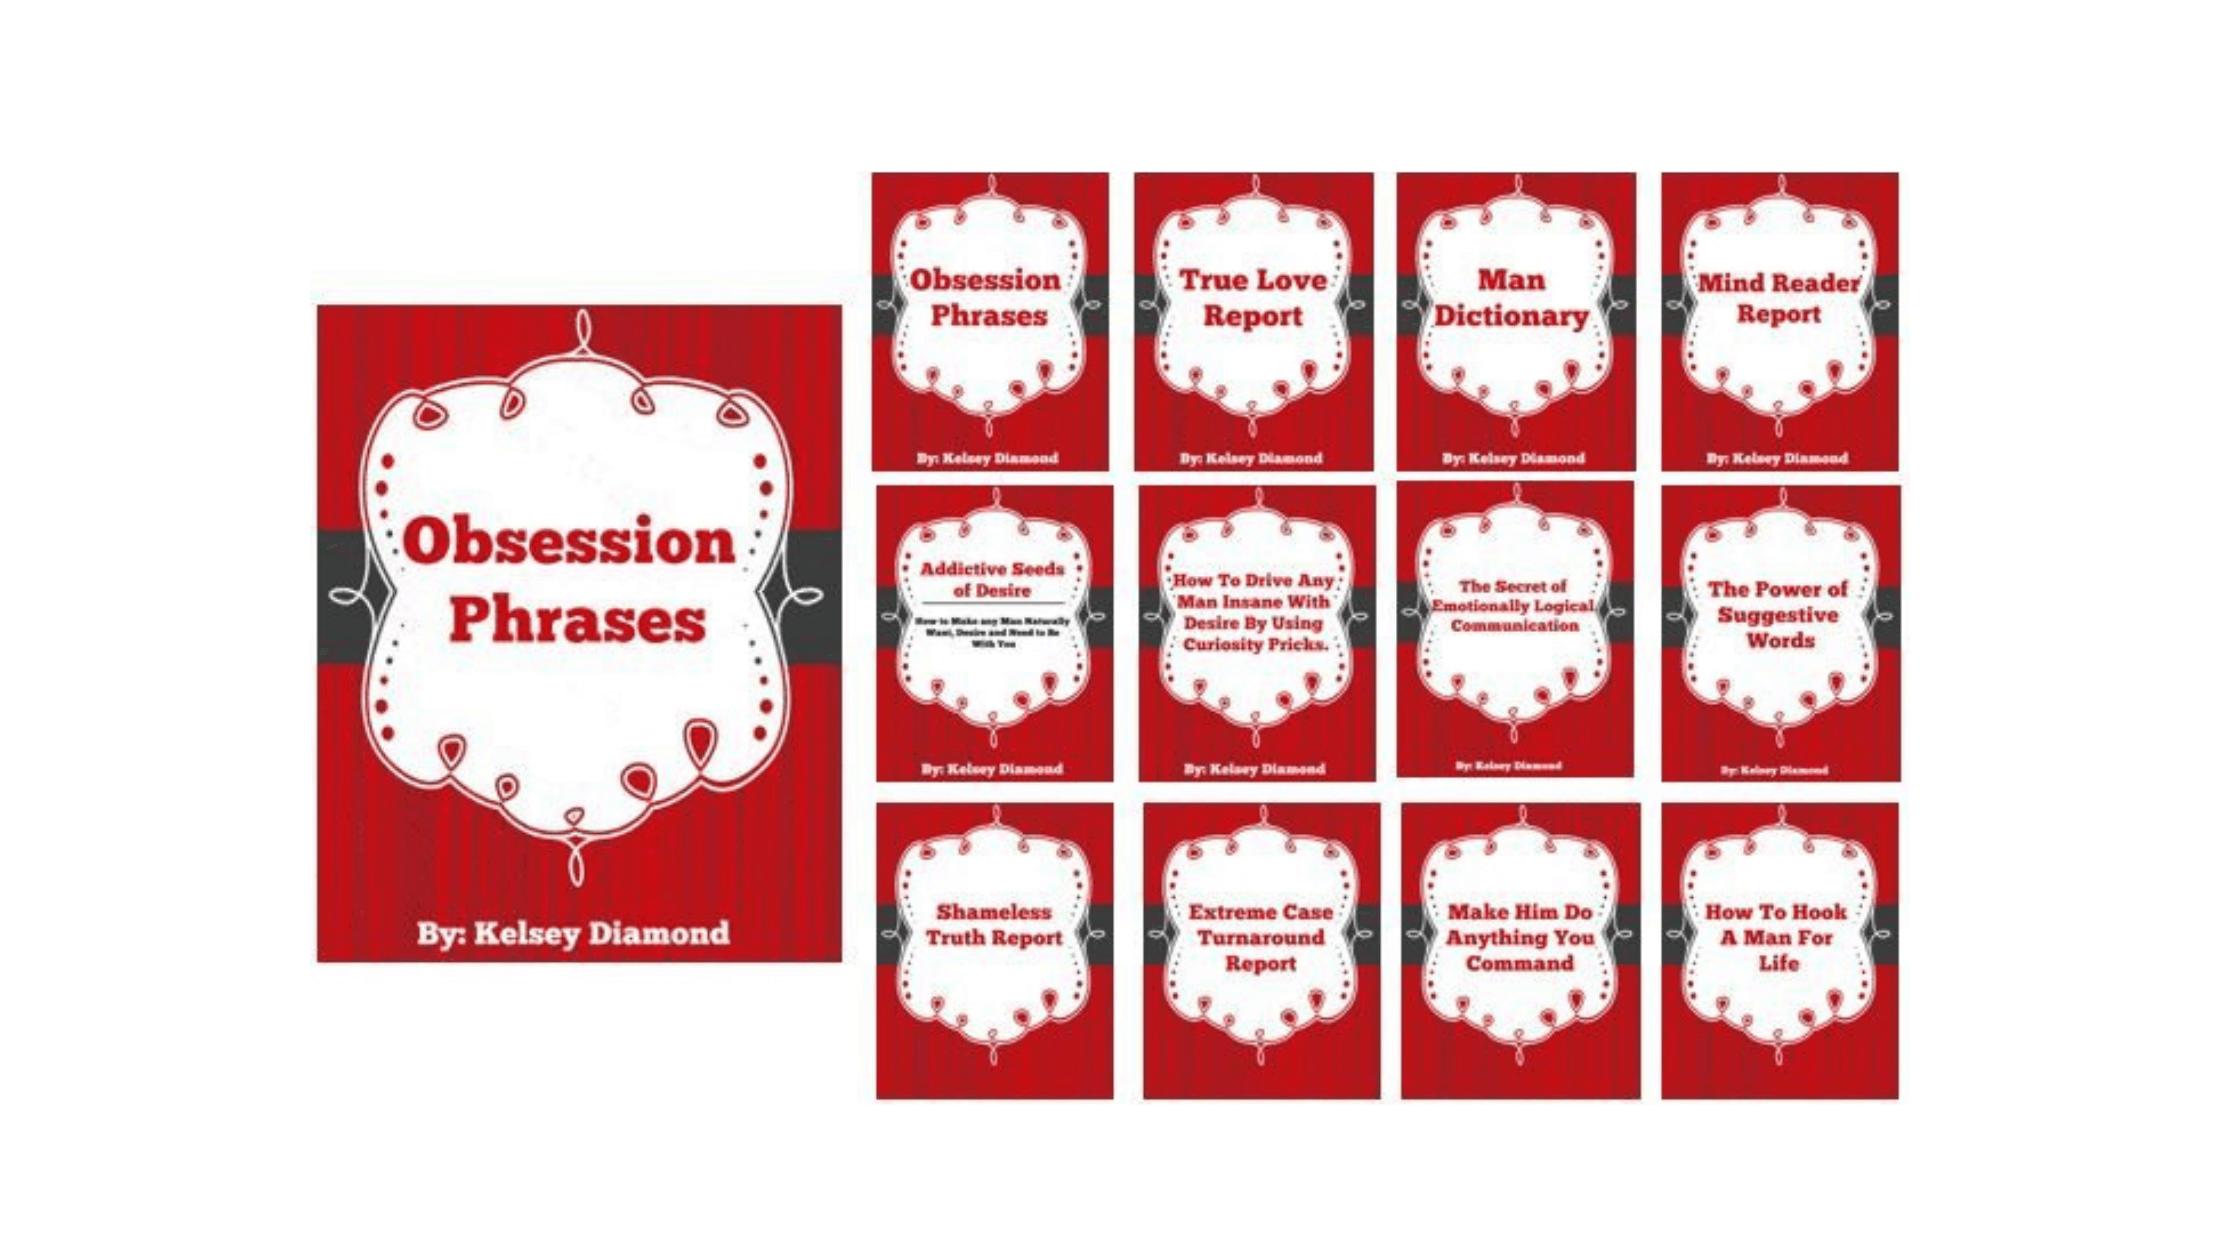 Obsession Phrases e-Book steps